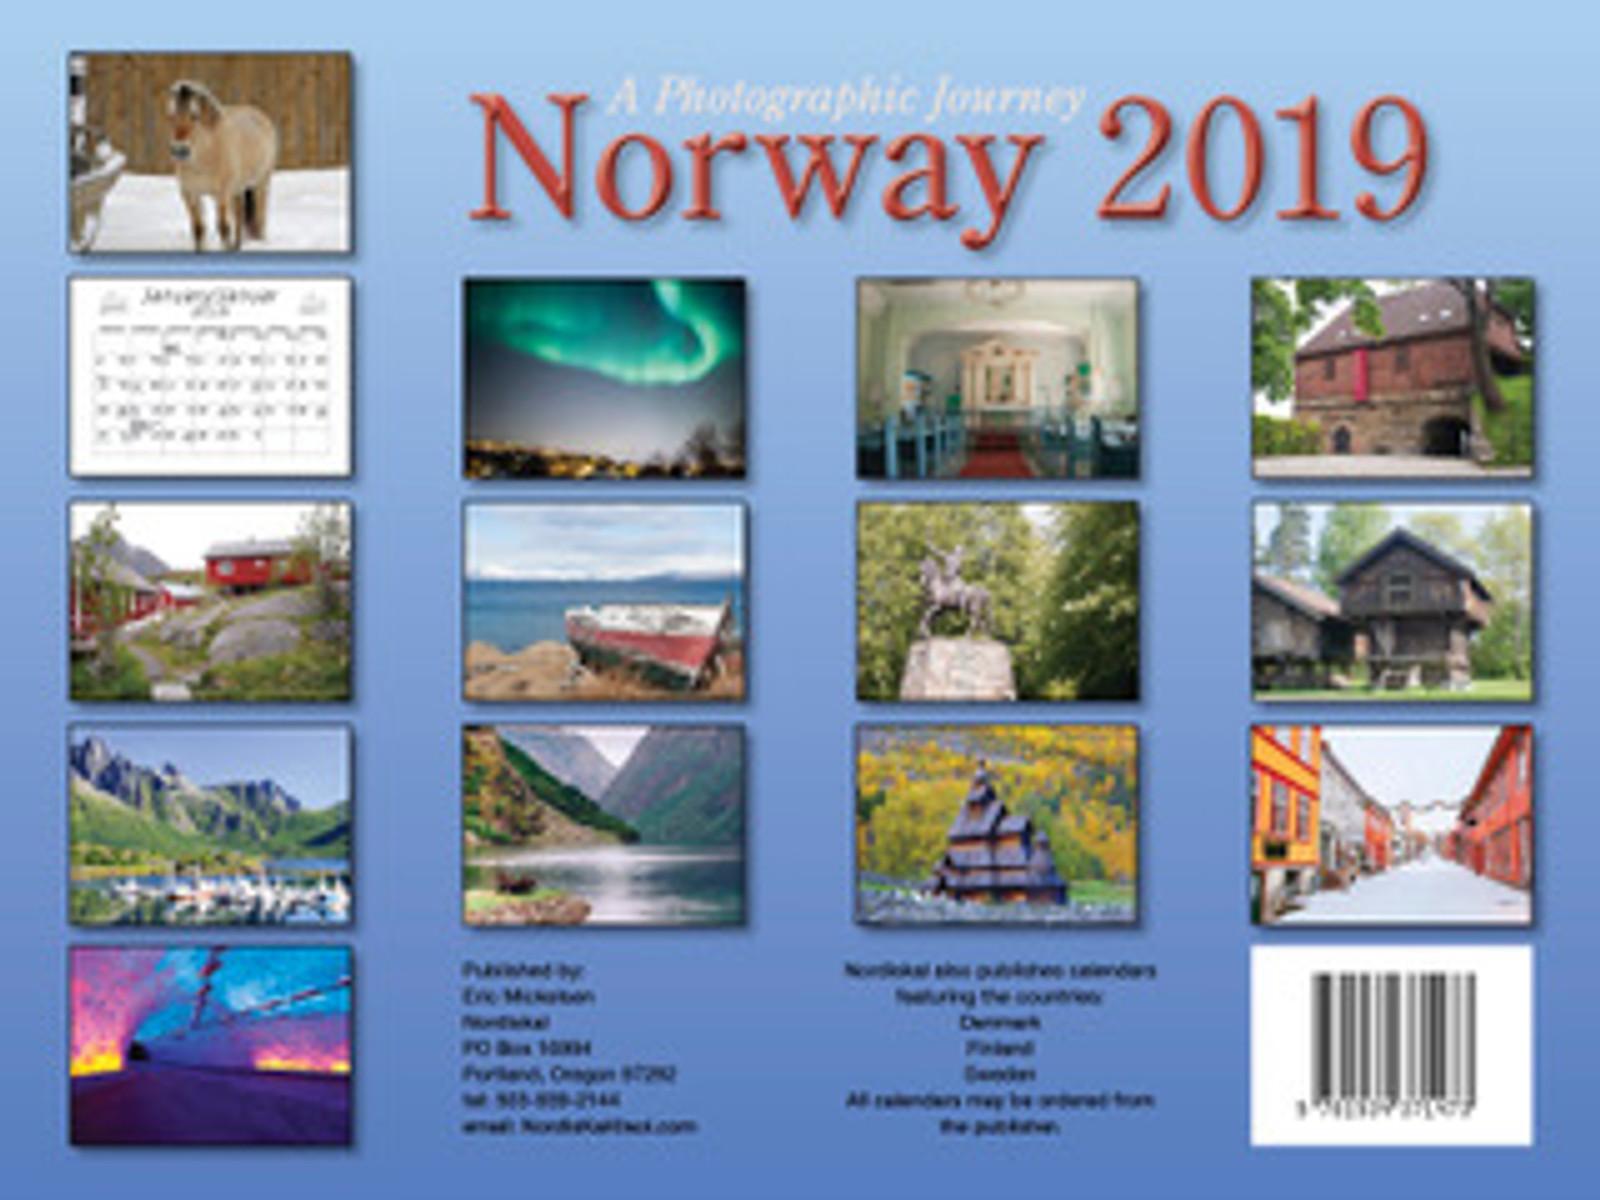 2019 Nordiskal Norway Calendar in Photographs - Back Cover